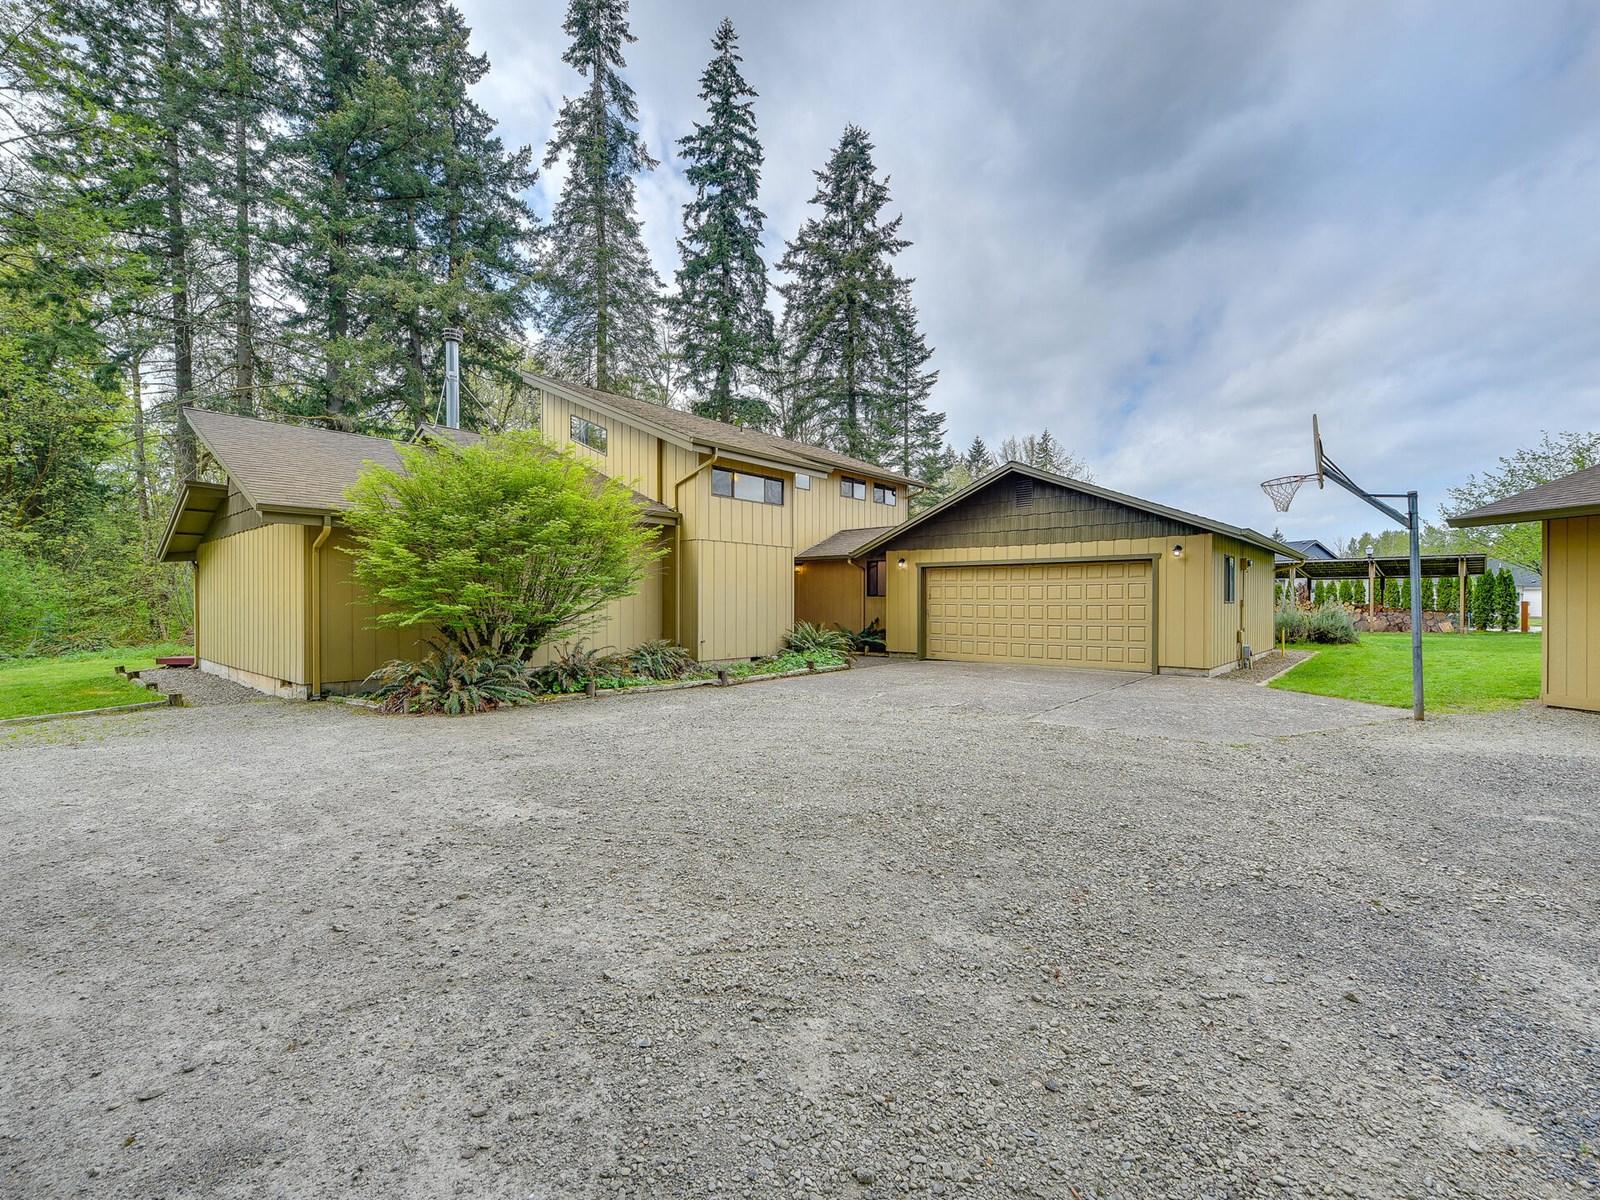 Home on Land For Sale | Battle Ground, Washington